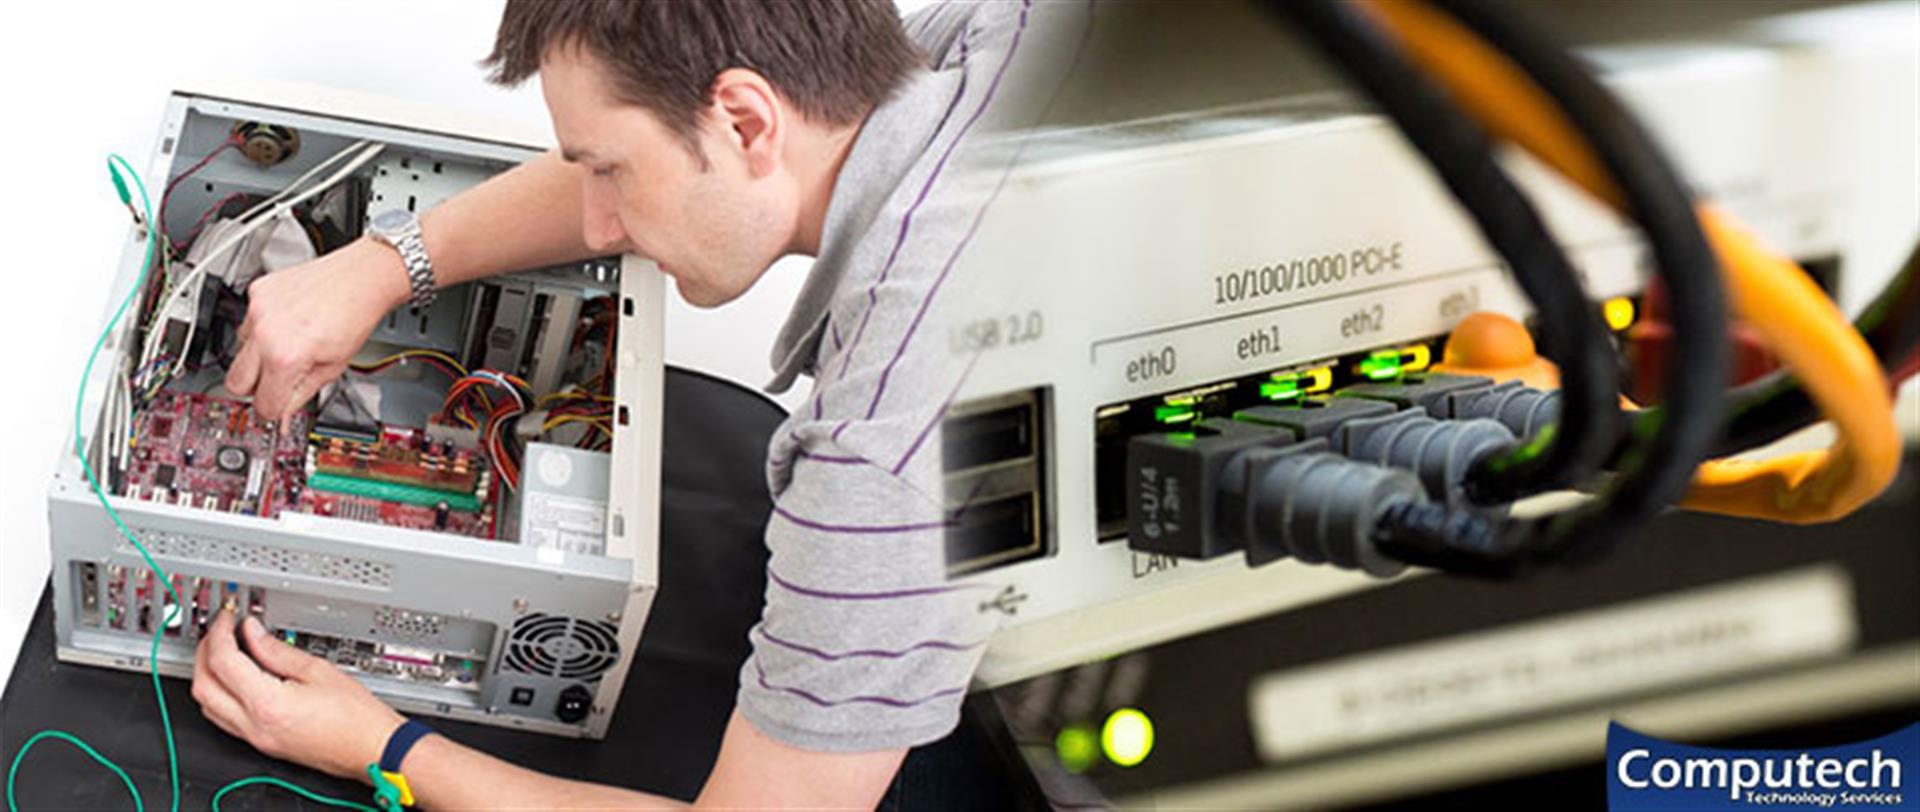 Eutaw Alabama On Site Computer PC & Printer Repair, Network, Telecom & Data Wiring Solutions